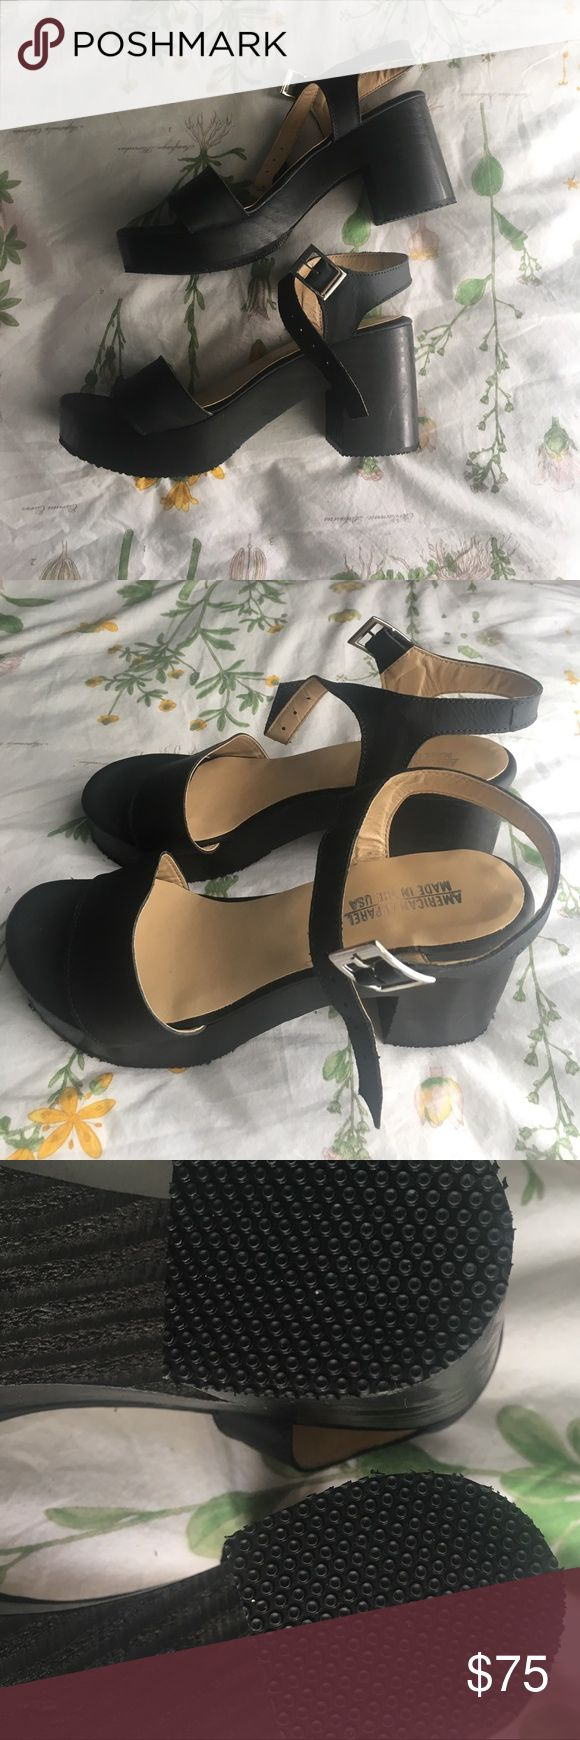 Black jelly sandals american apparel - American Apparel Wooden Heel Sandal Black Never Ever Worn Cute Ass American Apparel